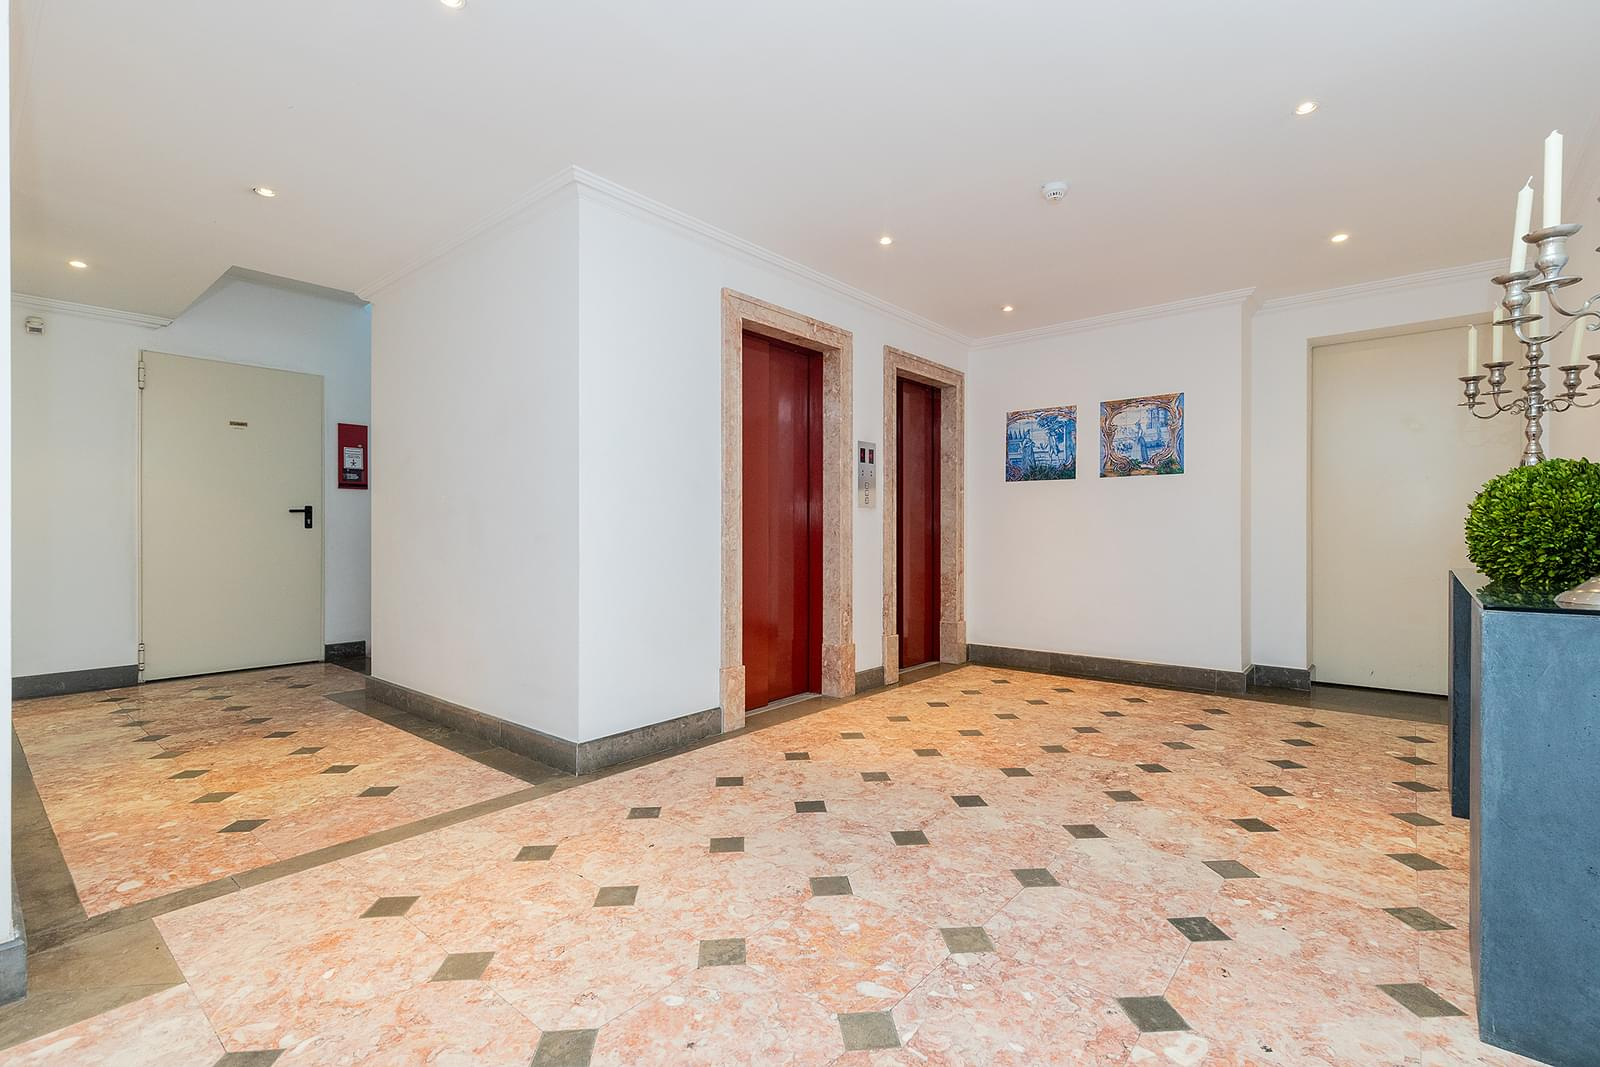 pf18618-apartamento-t4-1-lisboa-d0700e92-f94f-4b76-a0e3-411ca5269034